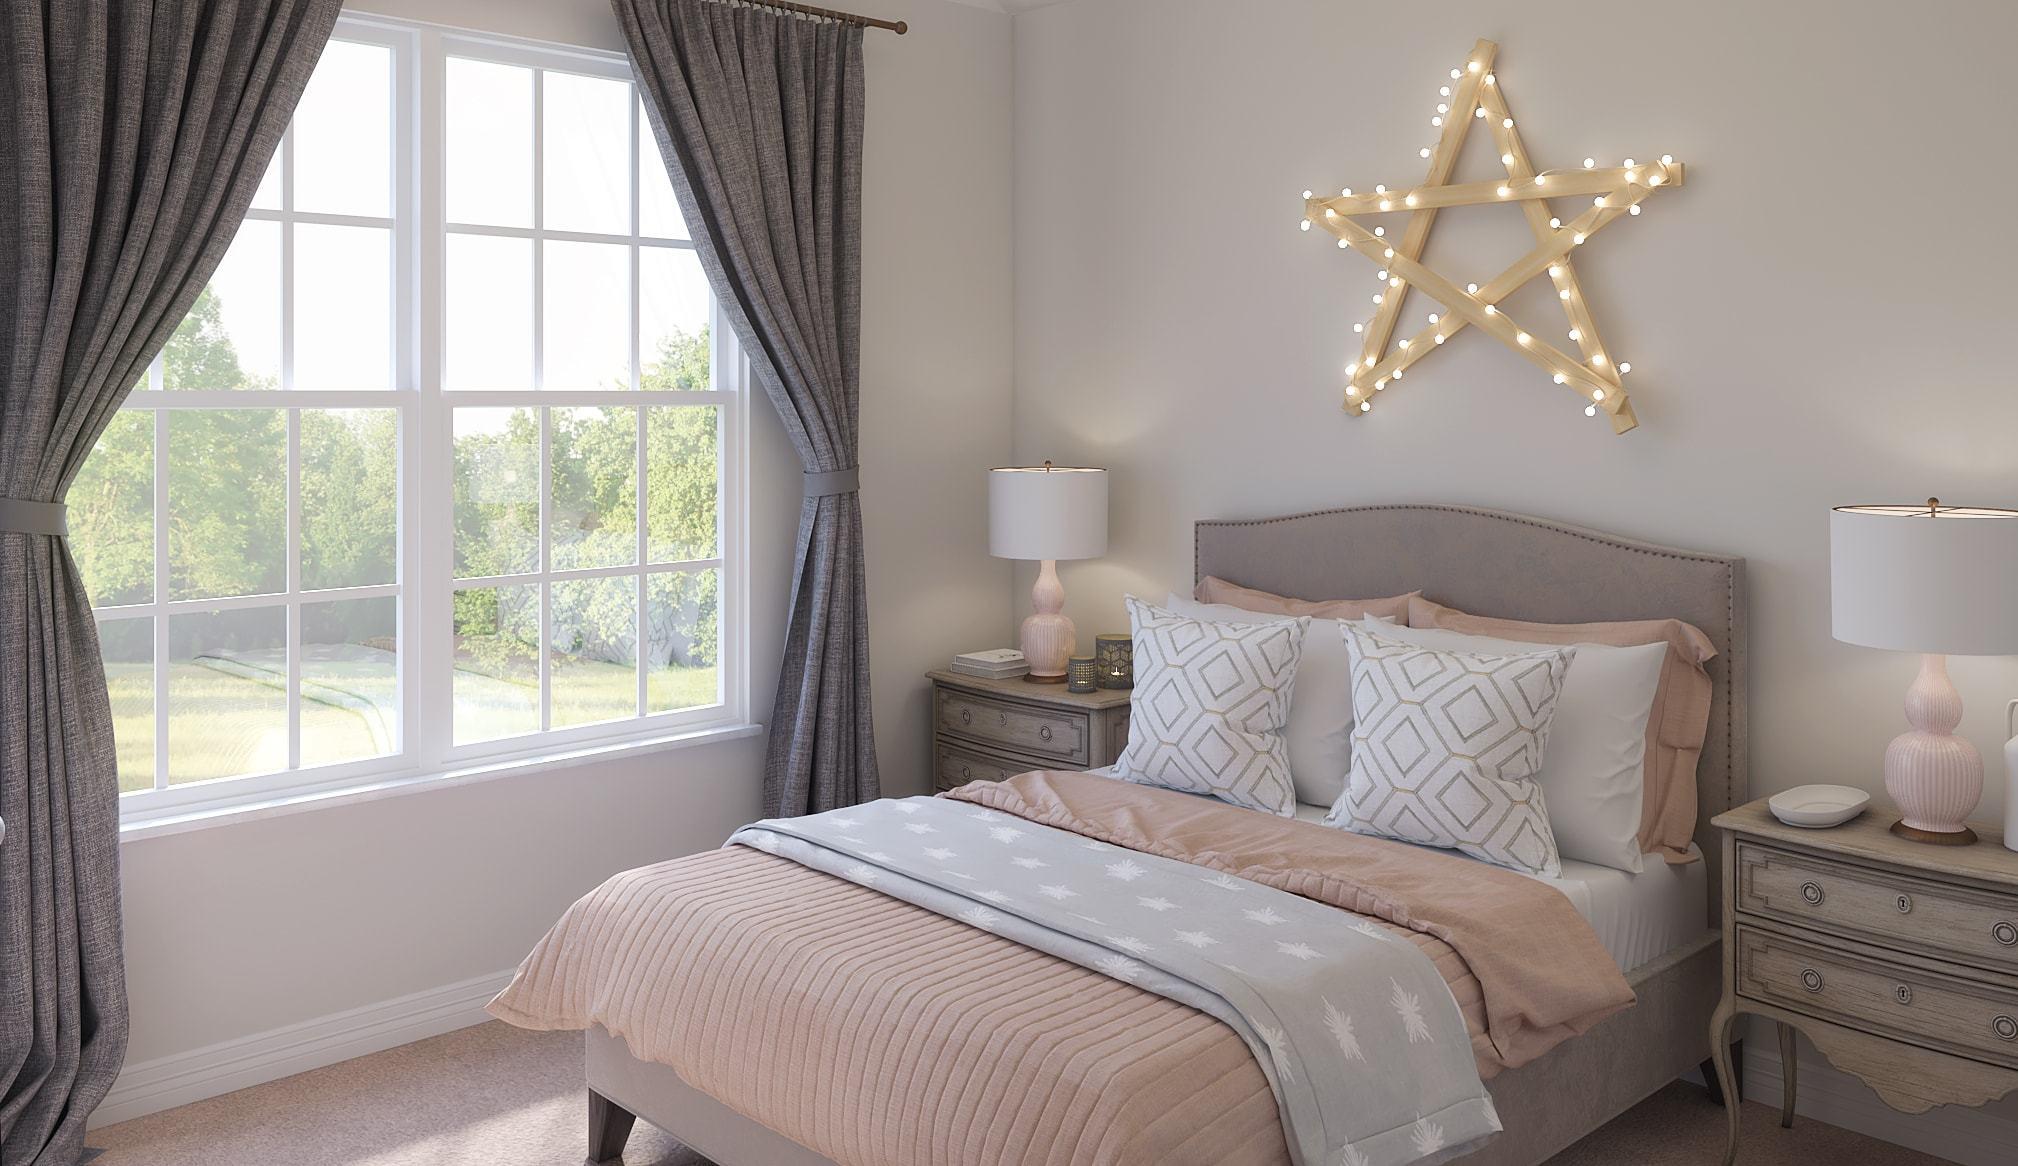 Bedroom featured in the Del Rio By Ashton Woods in San Antonio, TX